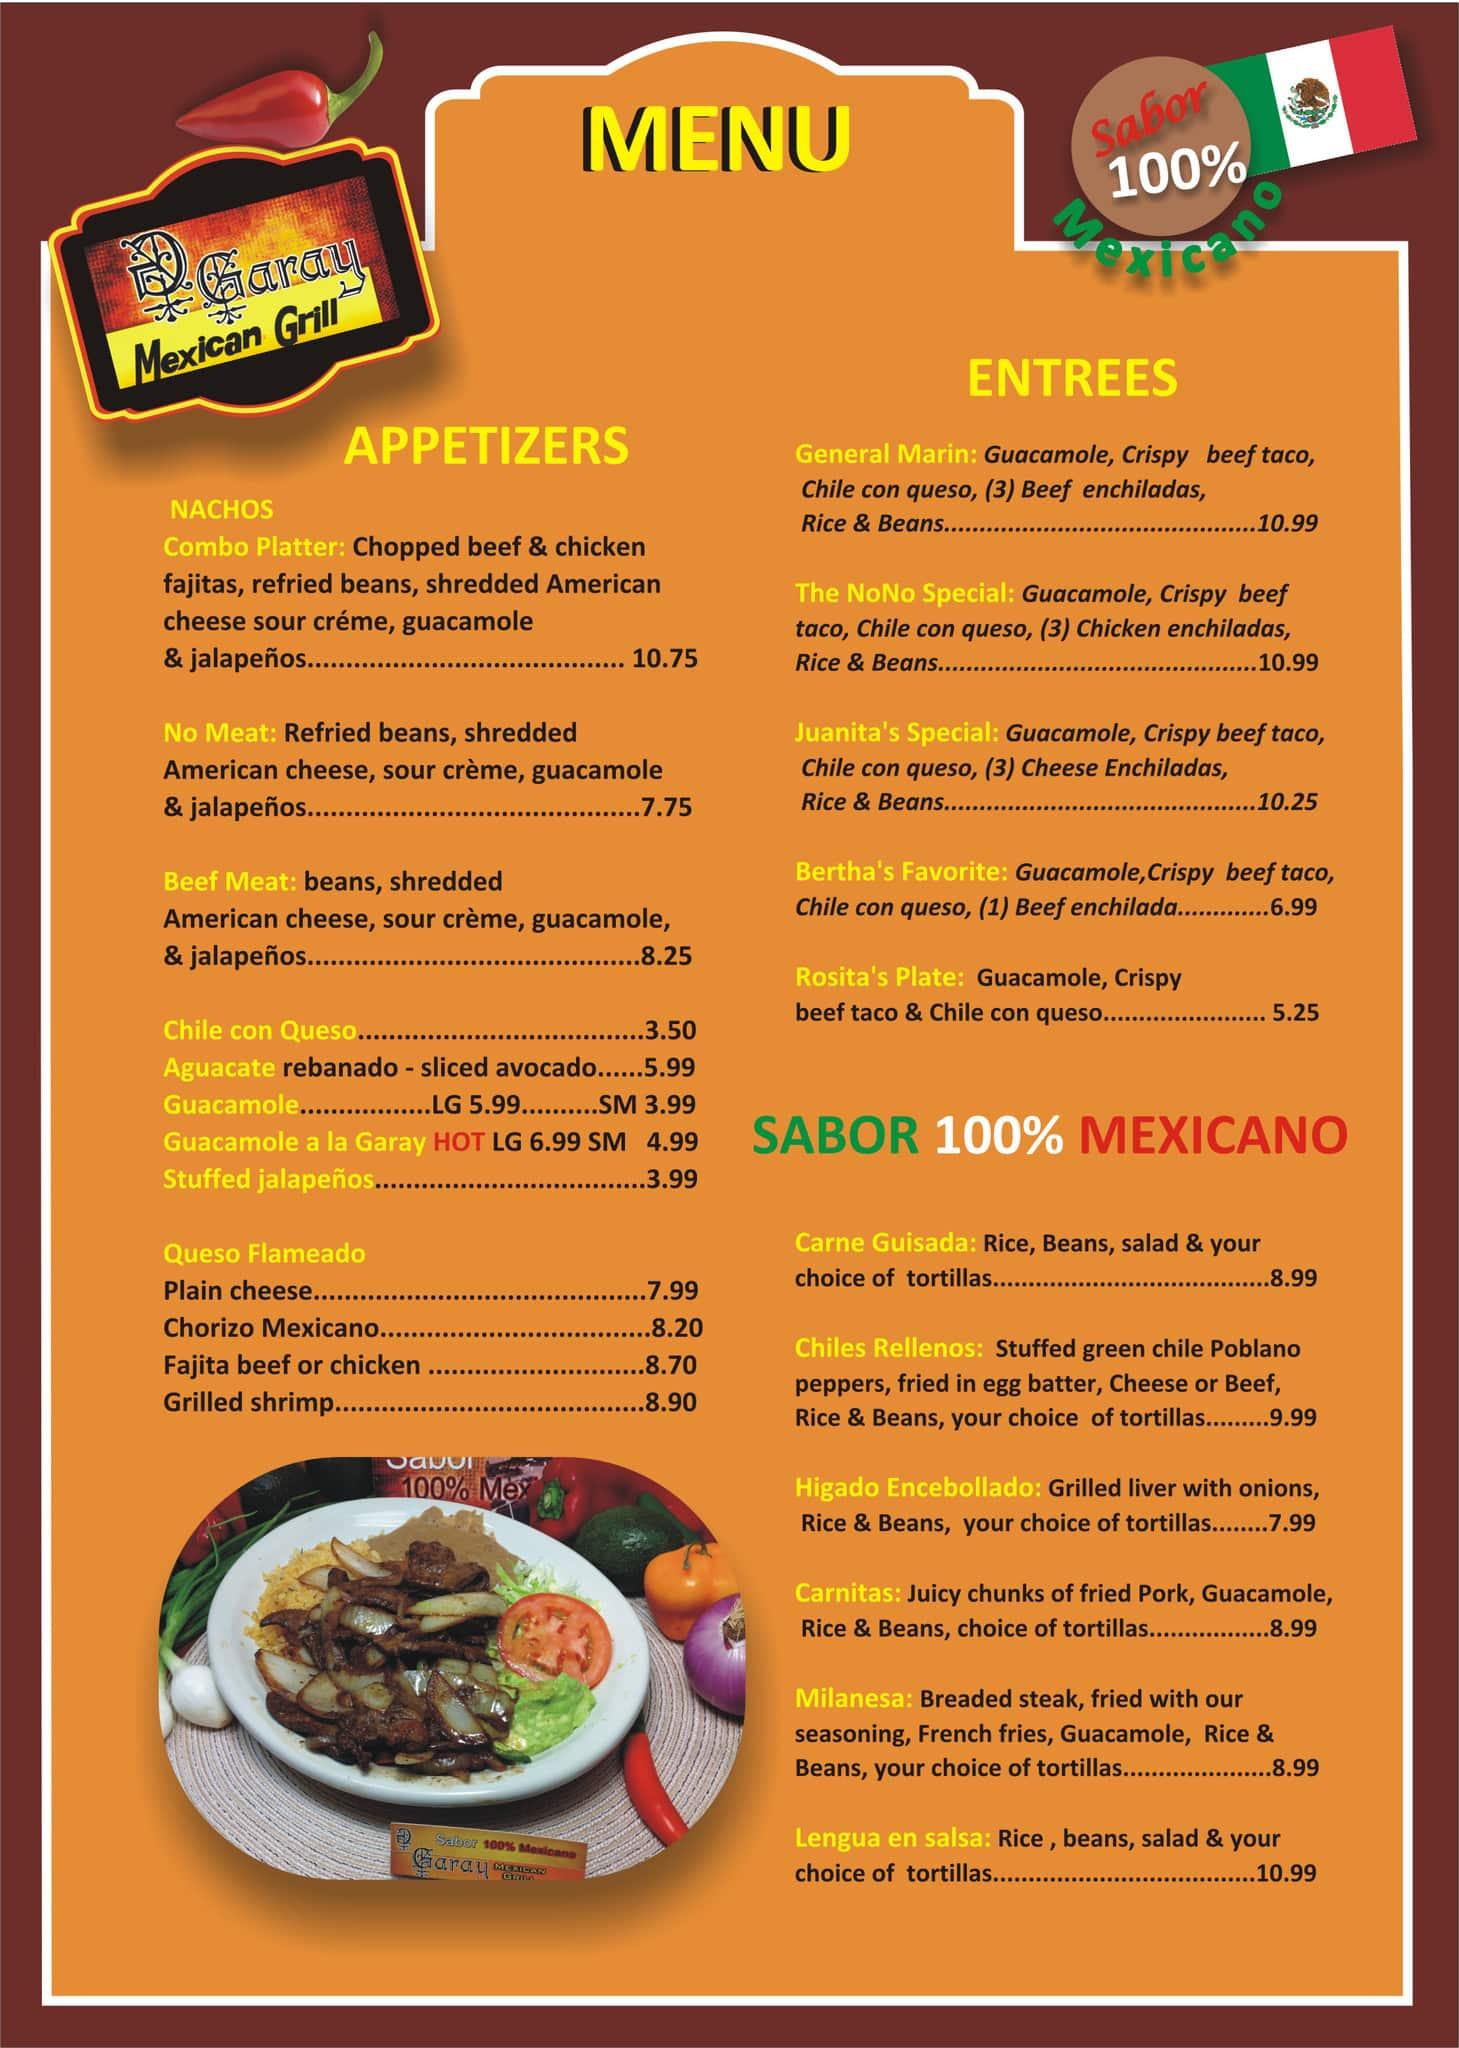 garay mexican grill menu, menu for garay mexican grill, northline